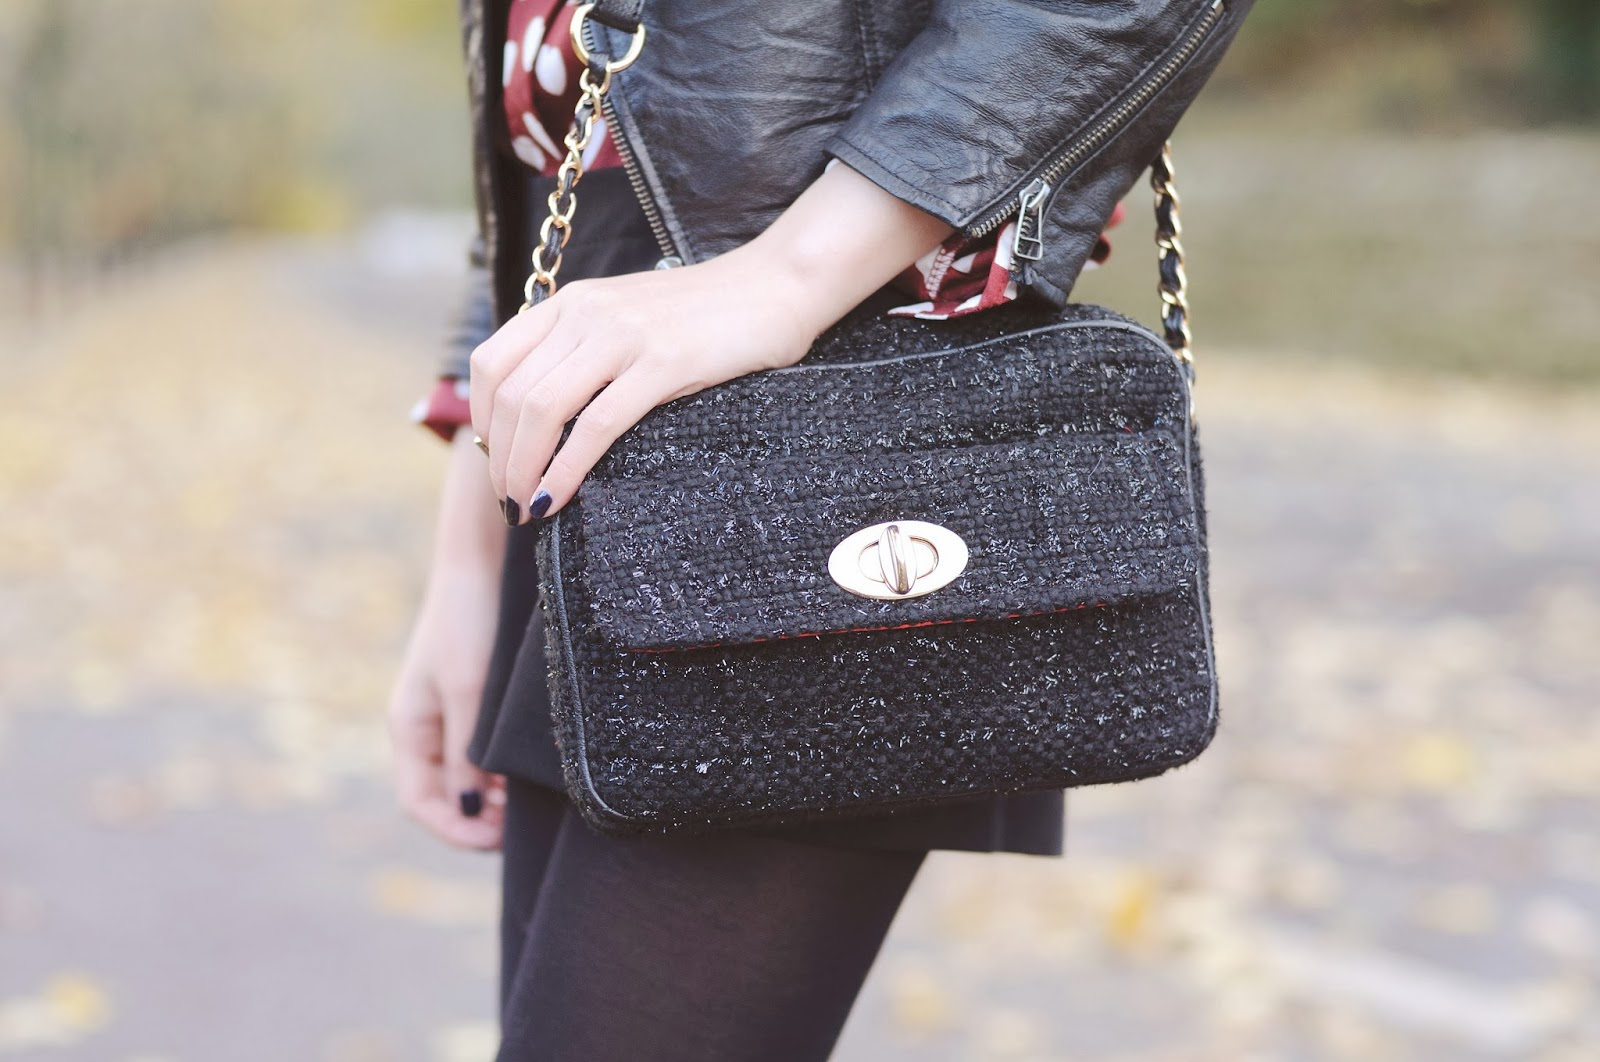 Tweed bag, affordable stylish bag, F&F, clothing at tesco